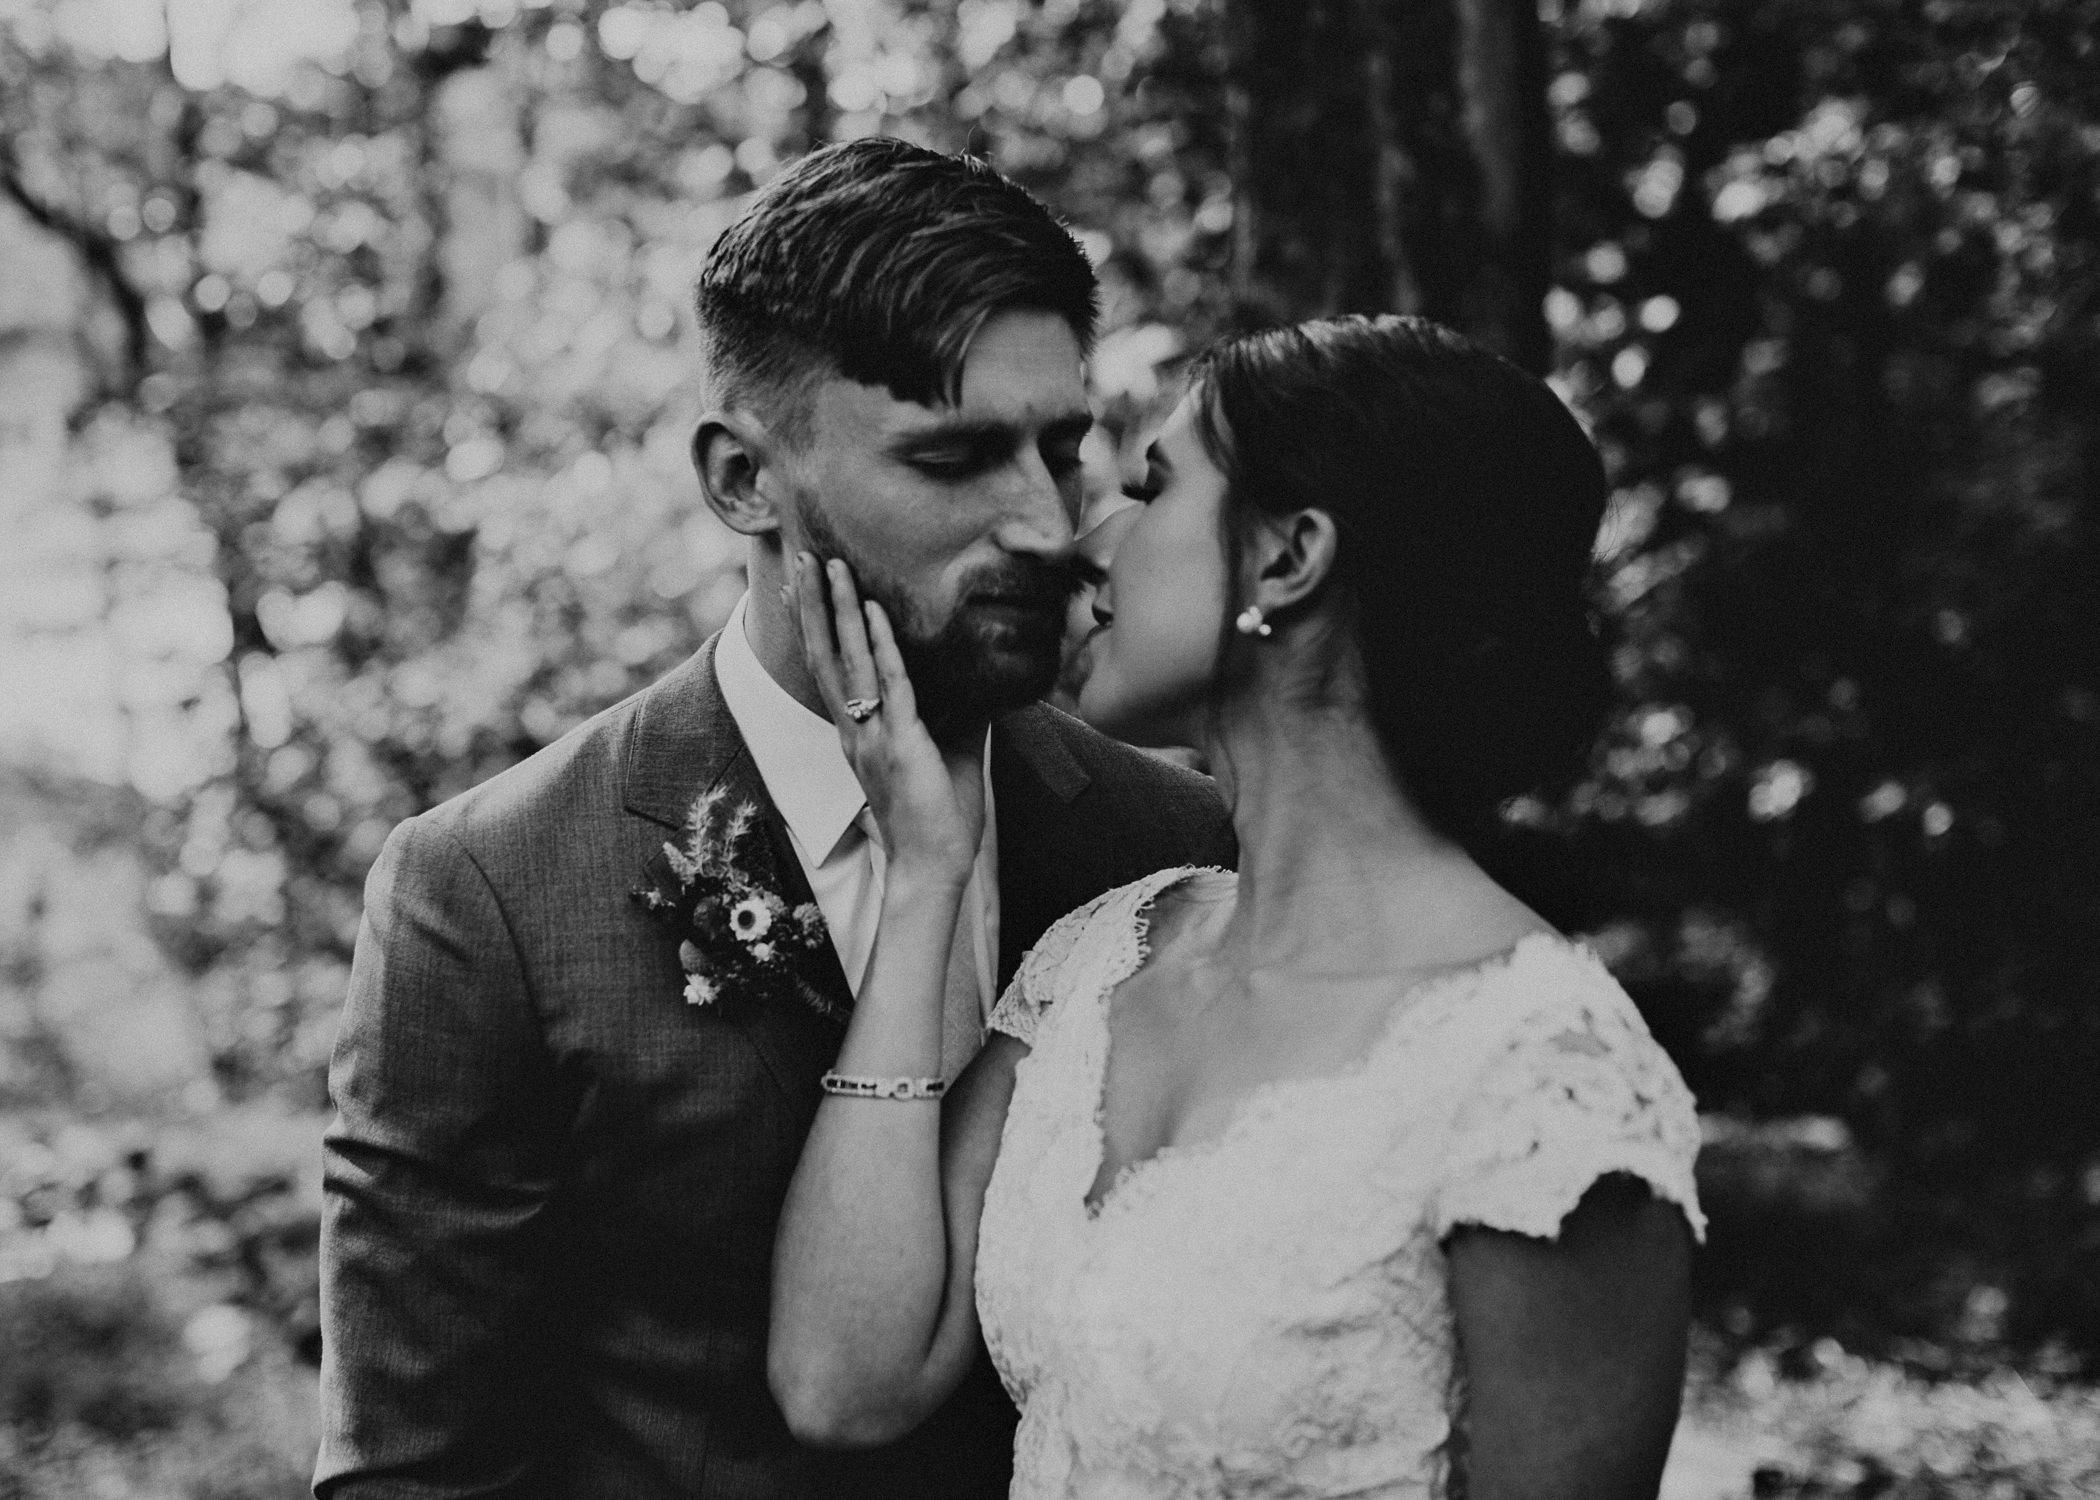 48 Bride & Groom first look before the ceremony on wedding day - Atlanta Wedding Photographer .jpg